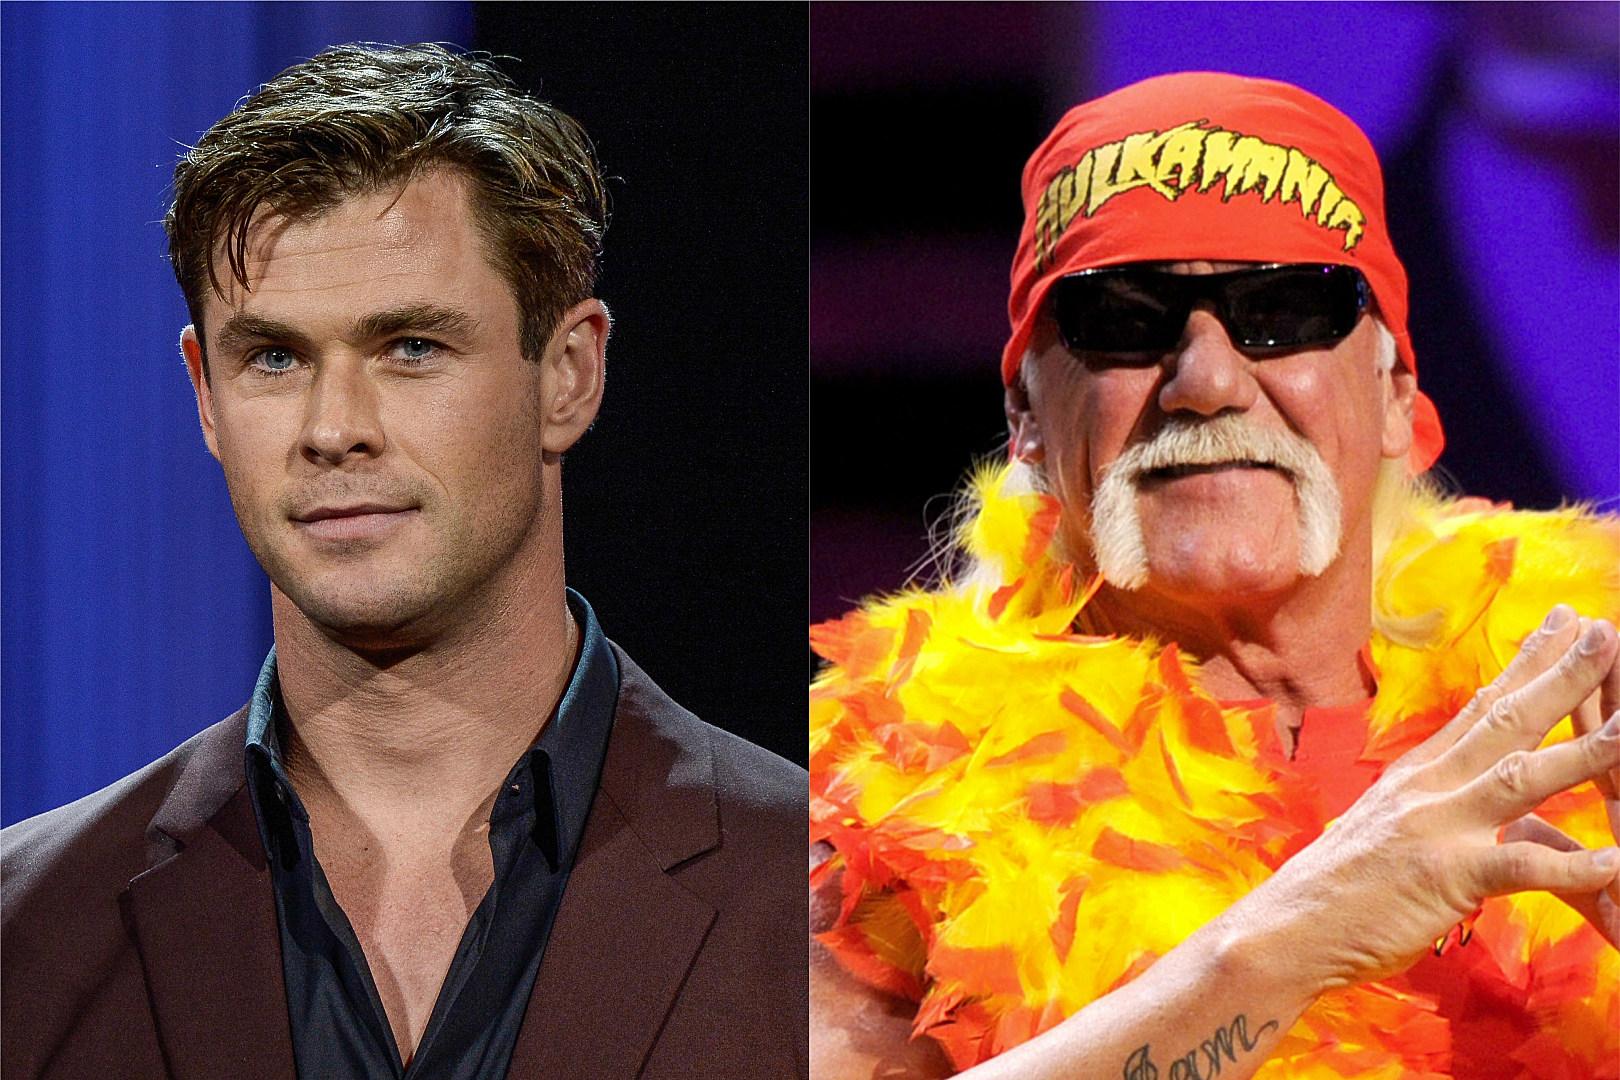 Hulk Hogan Will be Played by Chris Hemsworth in Upcoming Movie